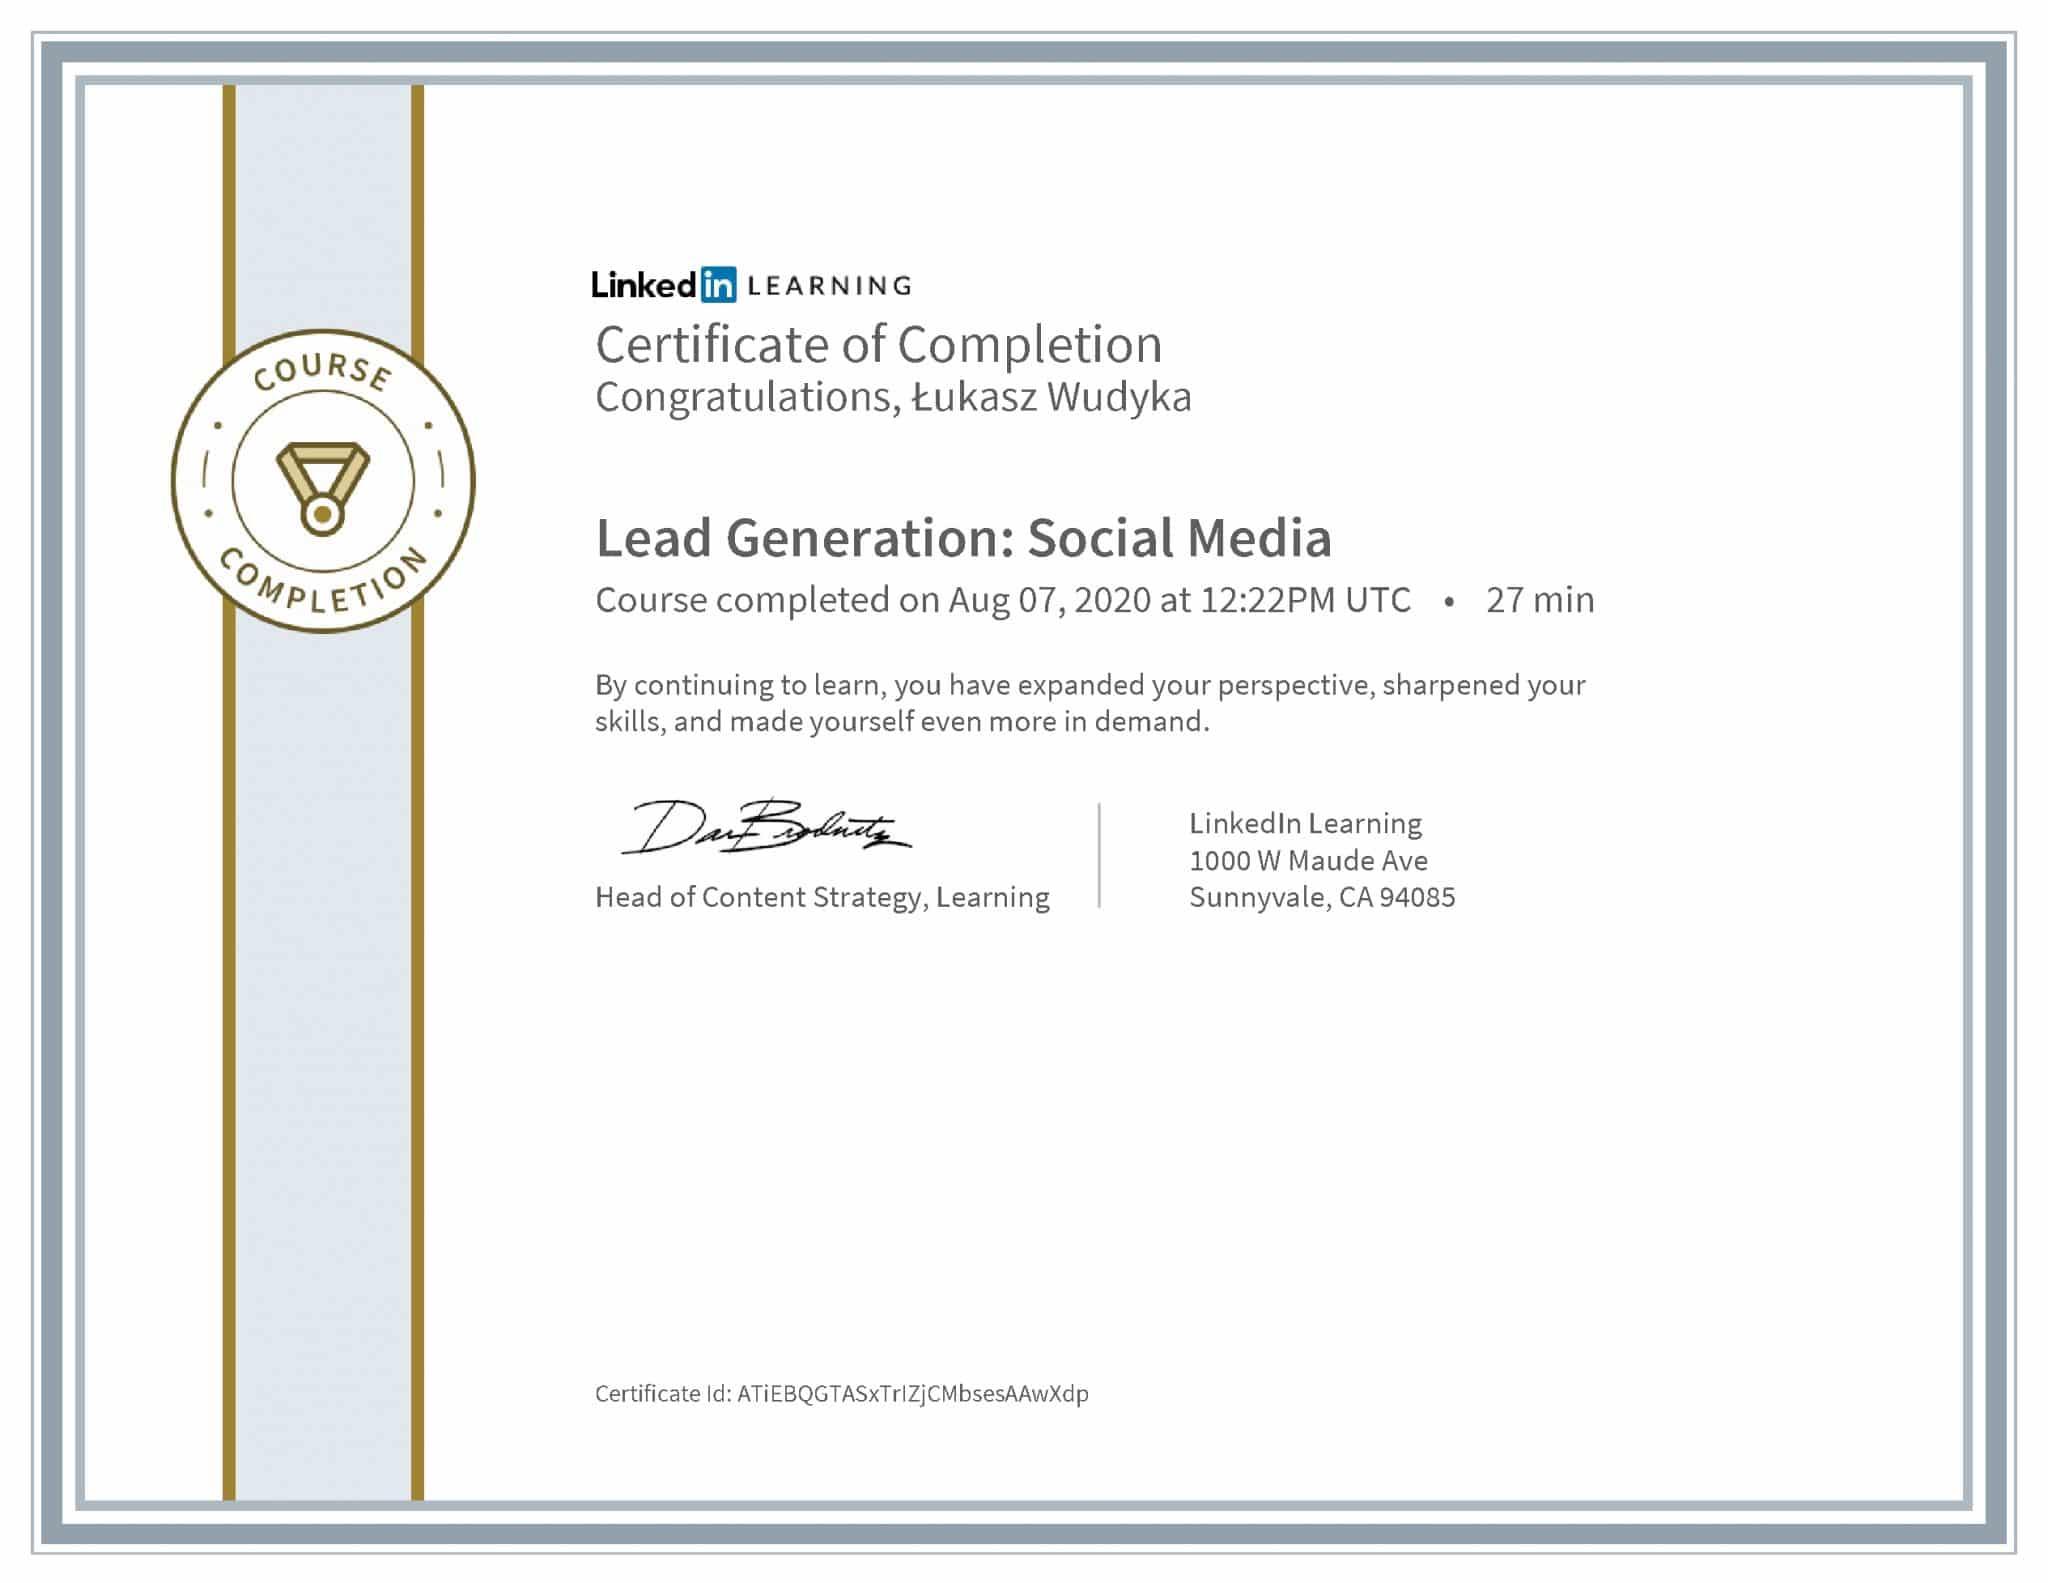 Łukasz Wudyka certyfikat LinkedIn Lead Generation: Social Media